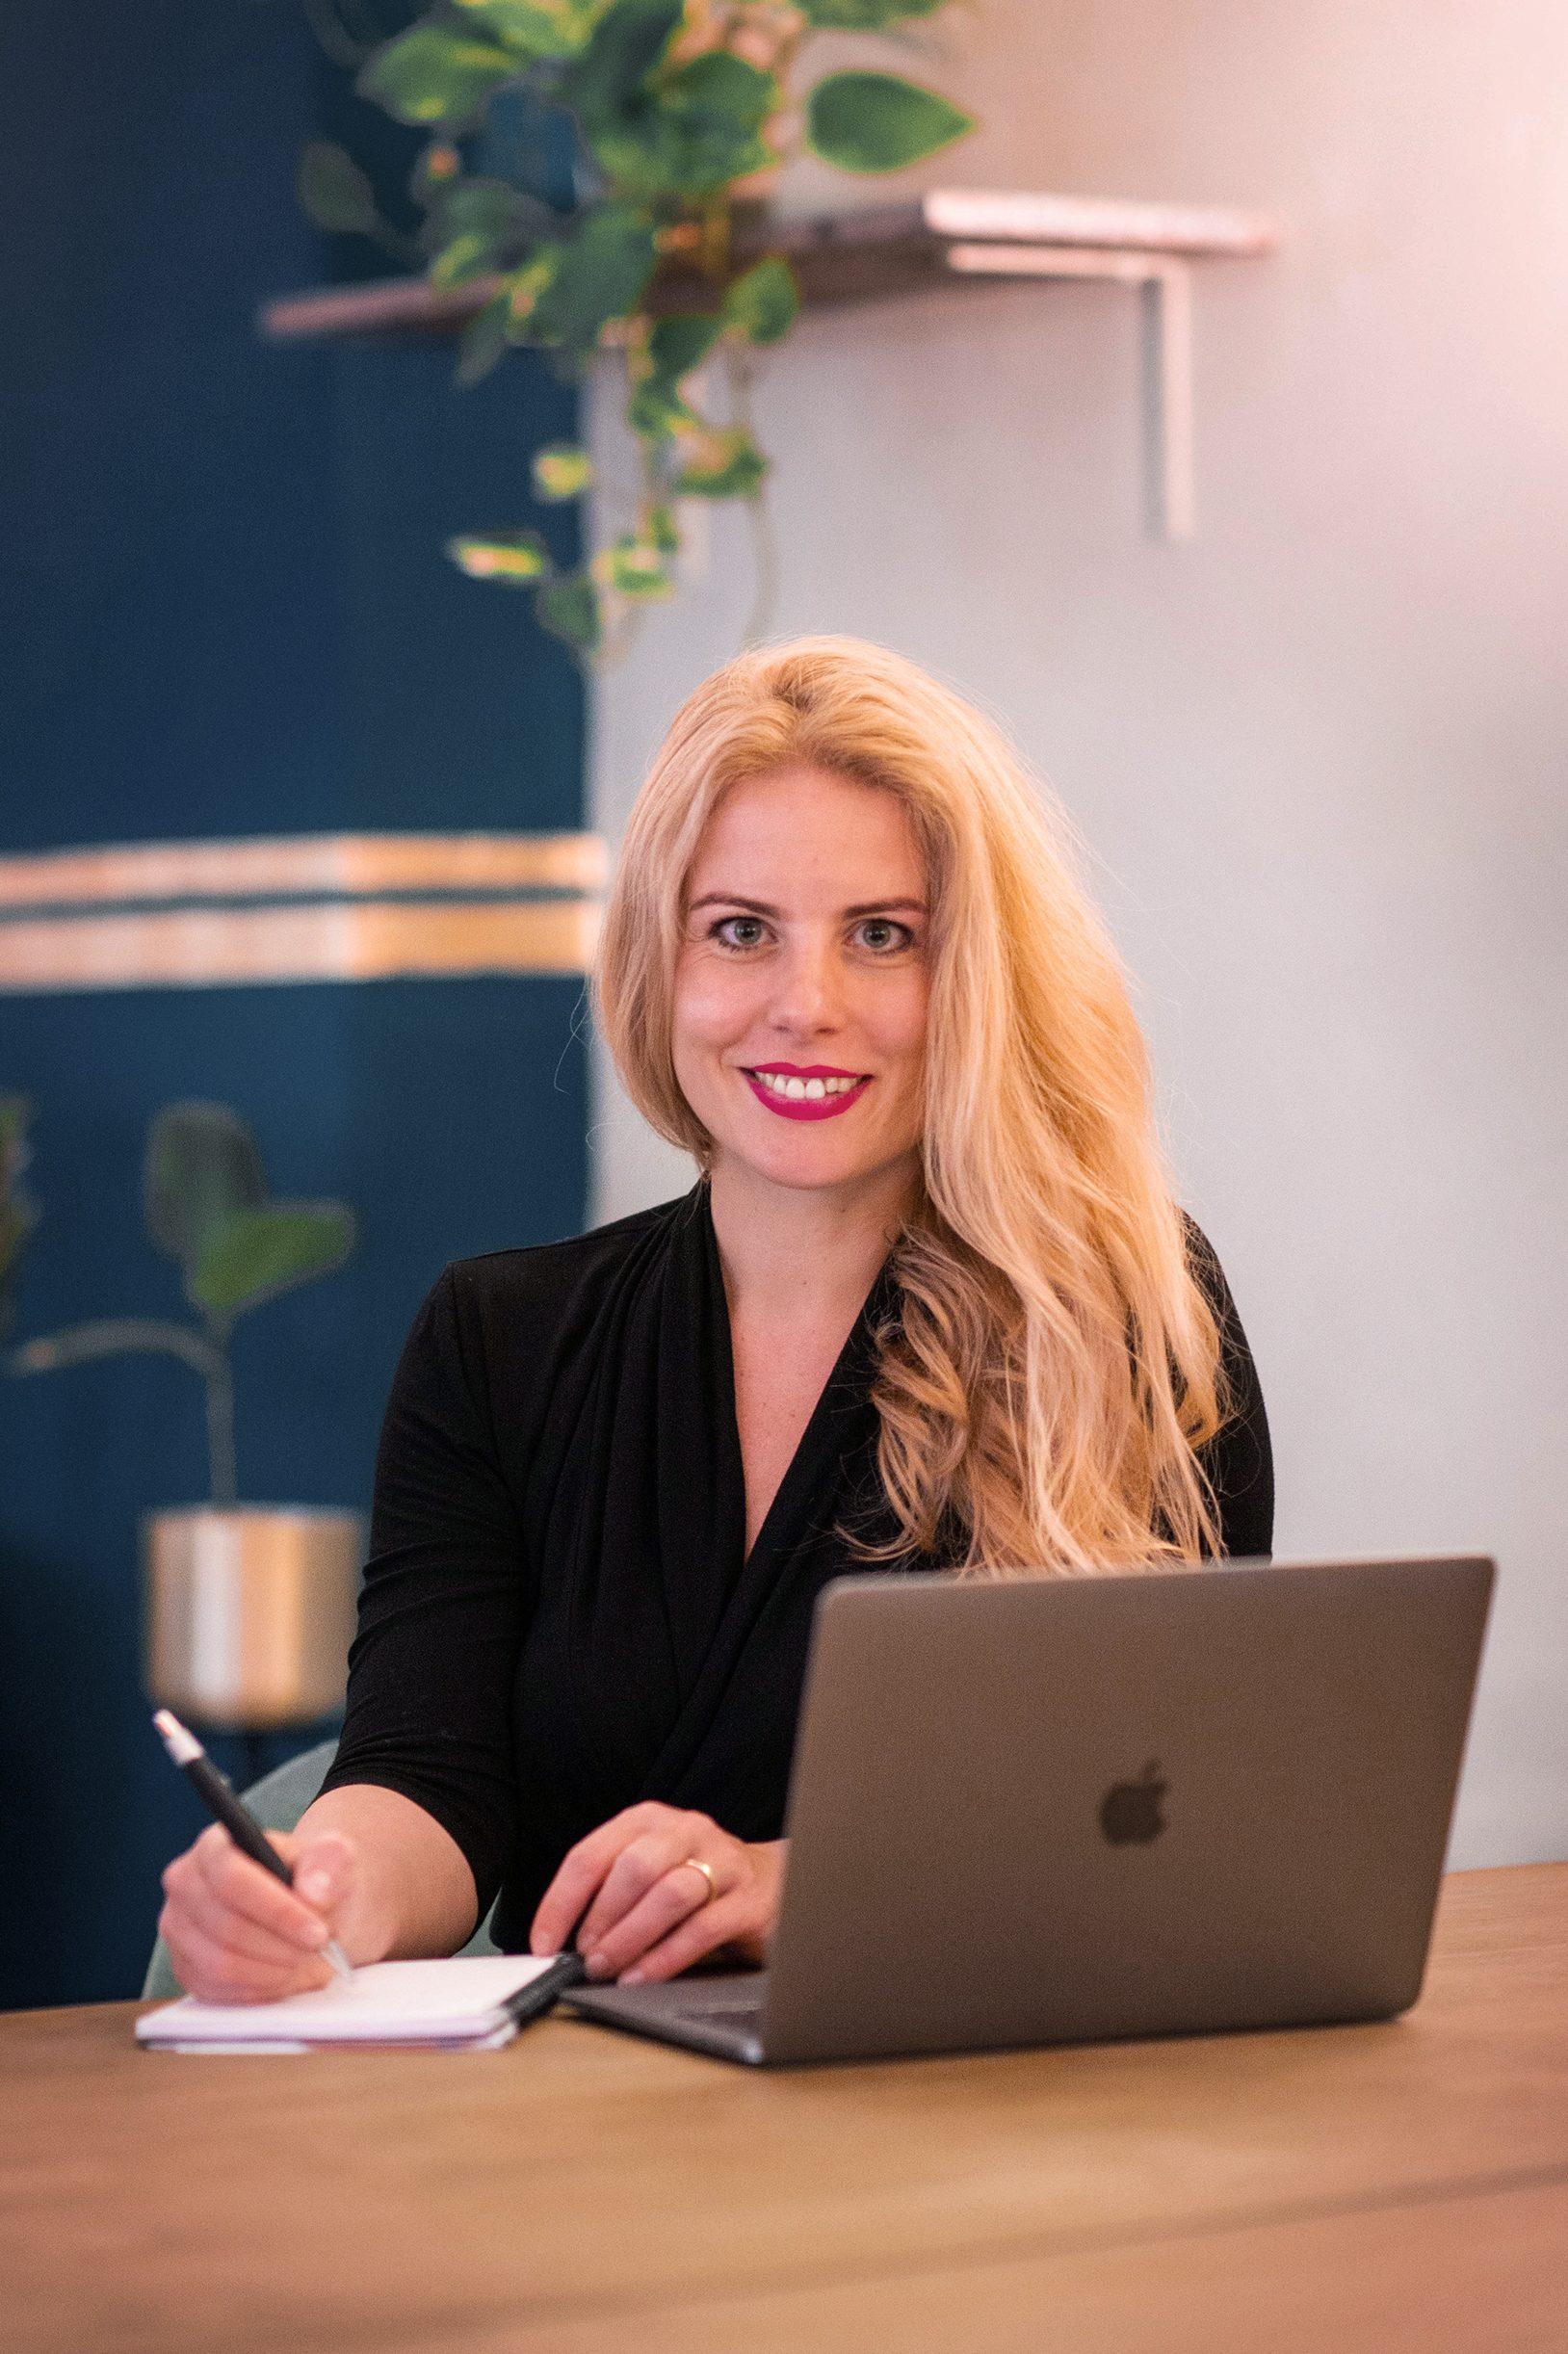 Aktien-Expertin Dr. Carmen Mayer